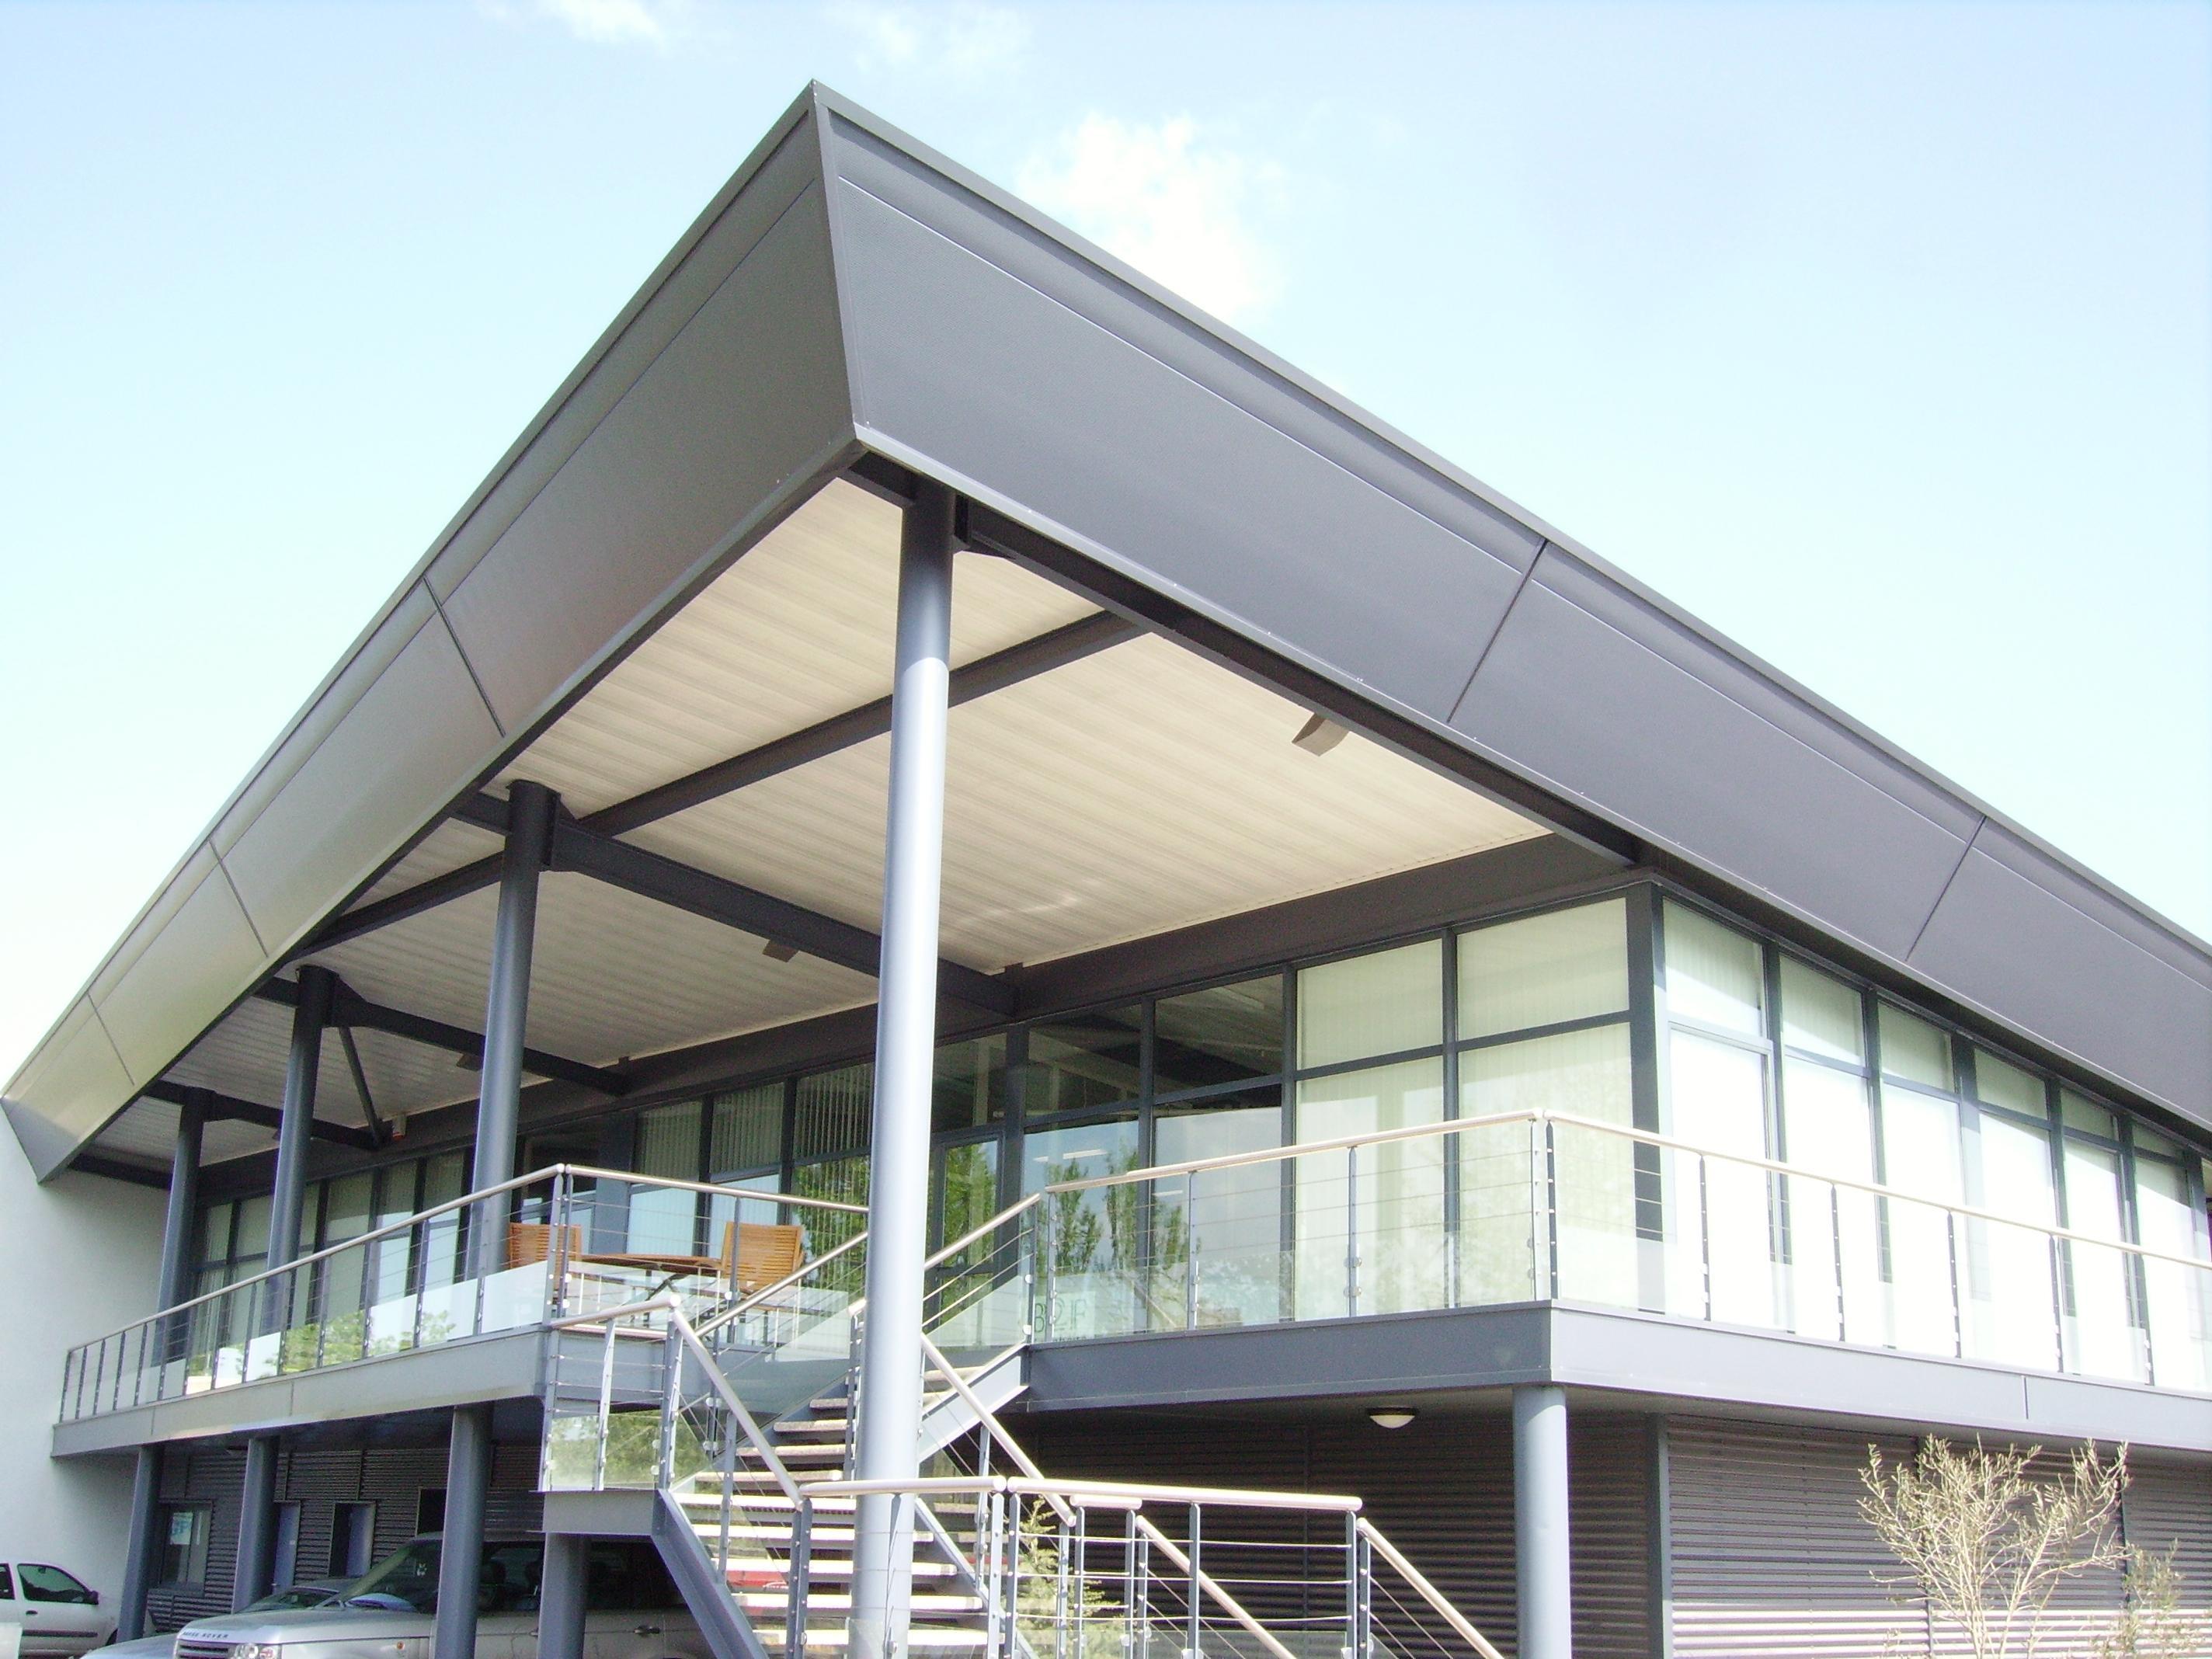 Couverture etancheite bardage vertical